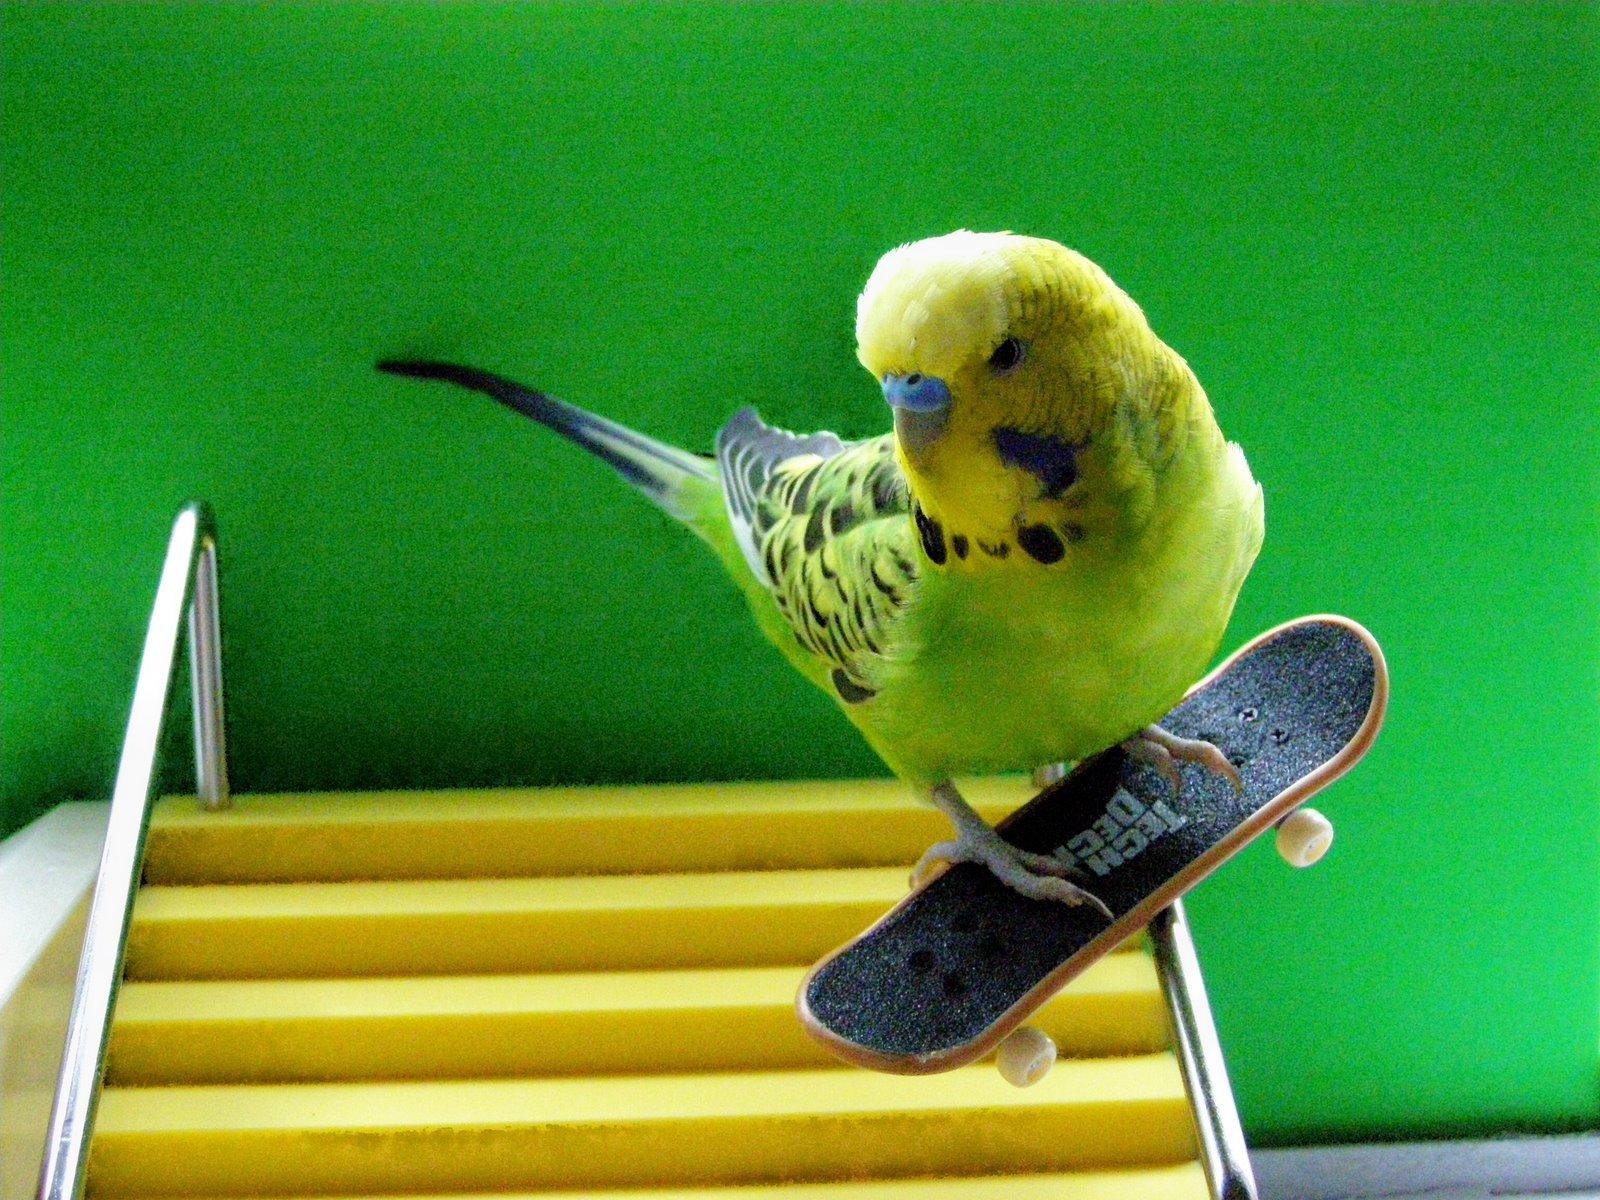 училась, работала, картинки на аву про попугаев актрисы помогла